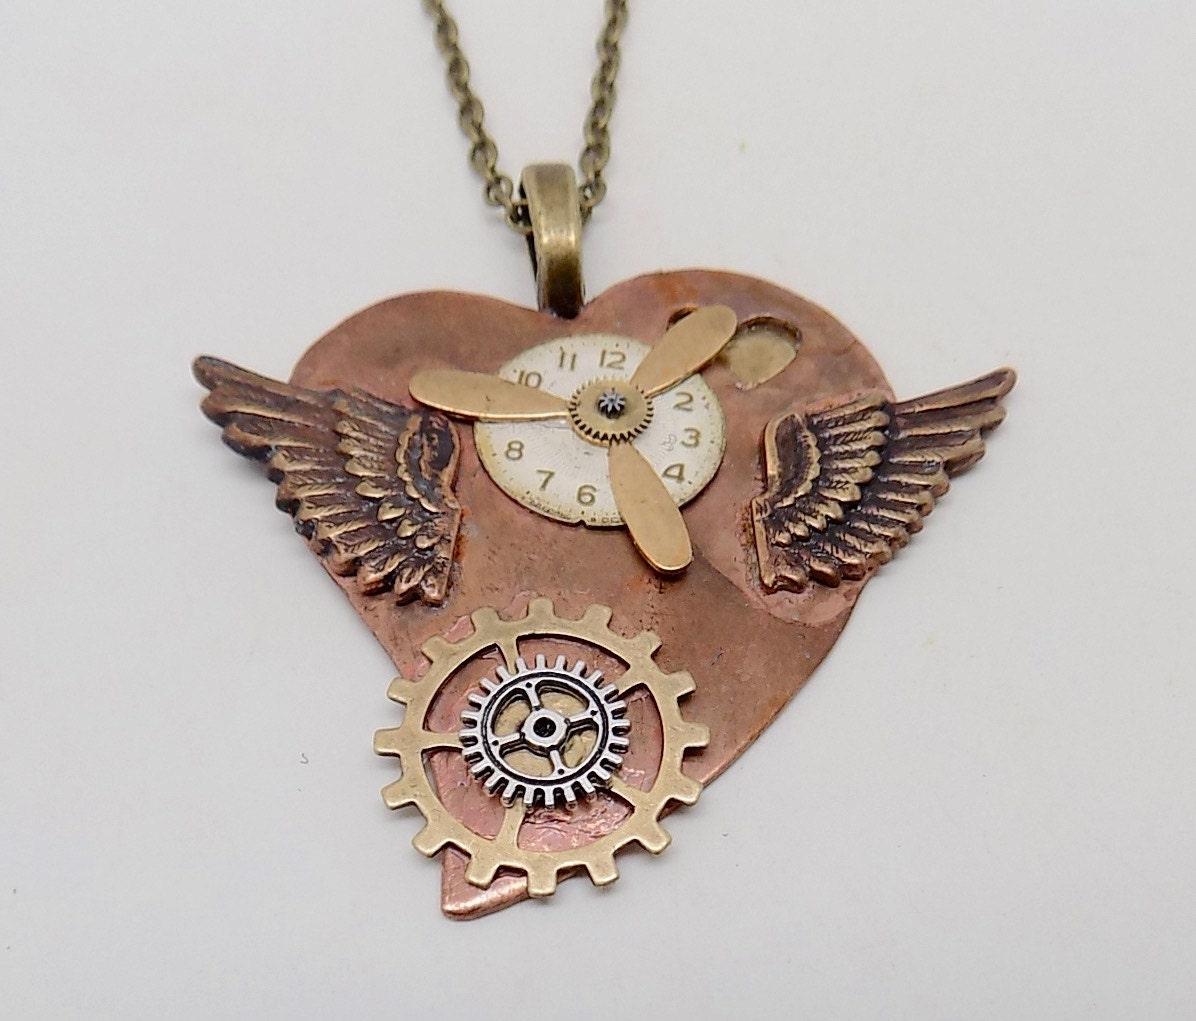 Choker Necklace Etsy: Steampunk Jewelry. Steampunk Necklace Pendant By Slotzkin